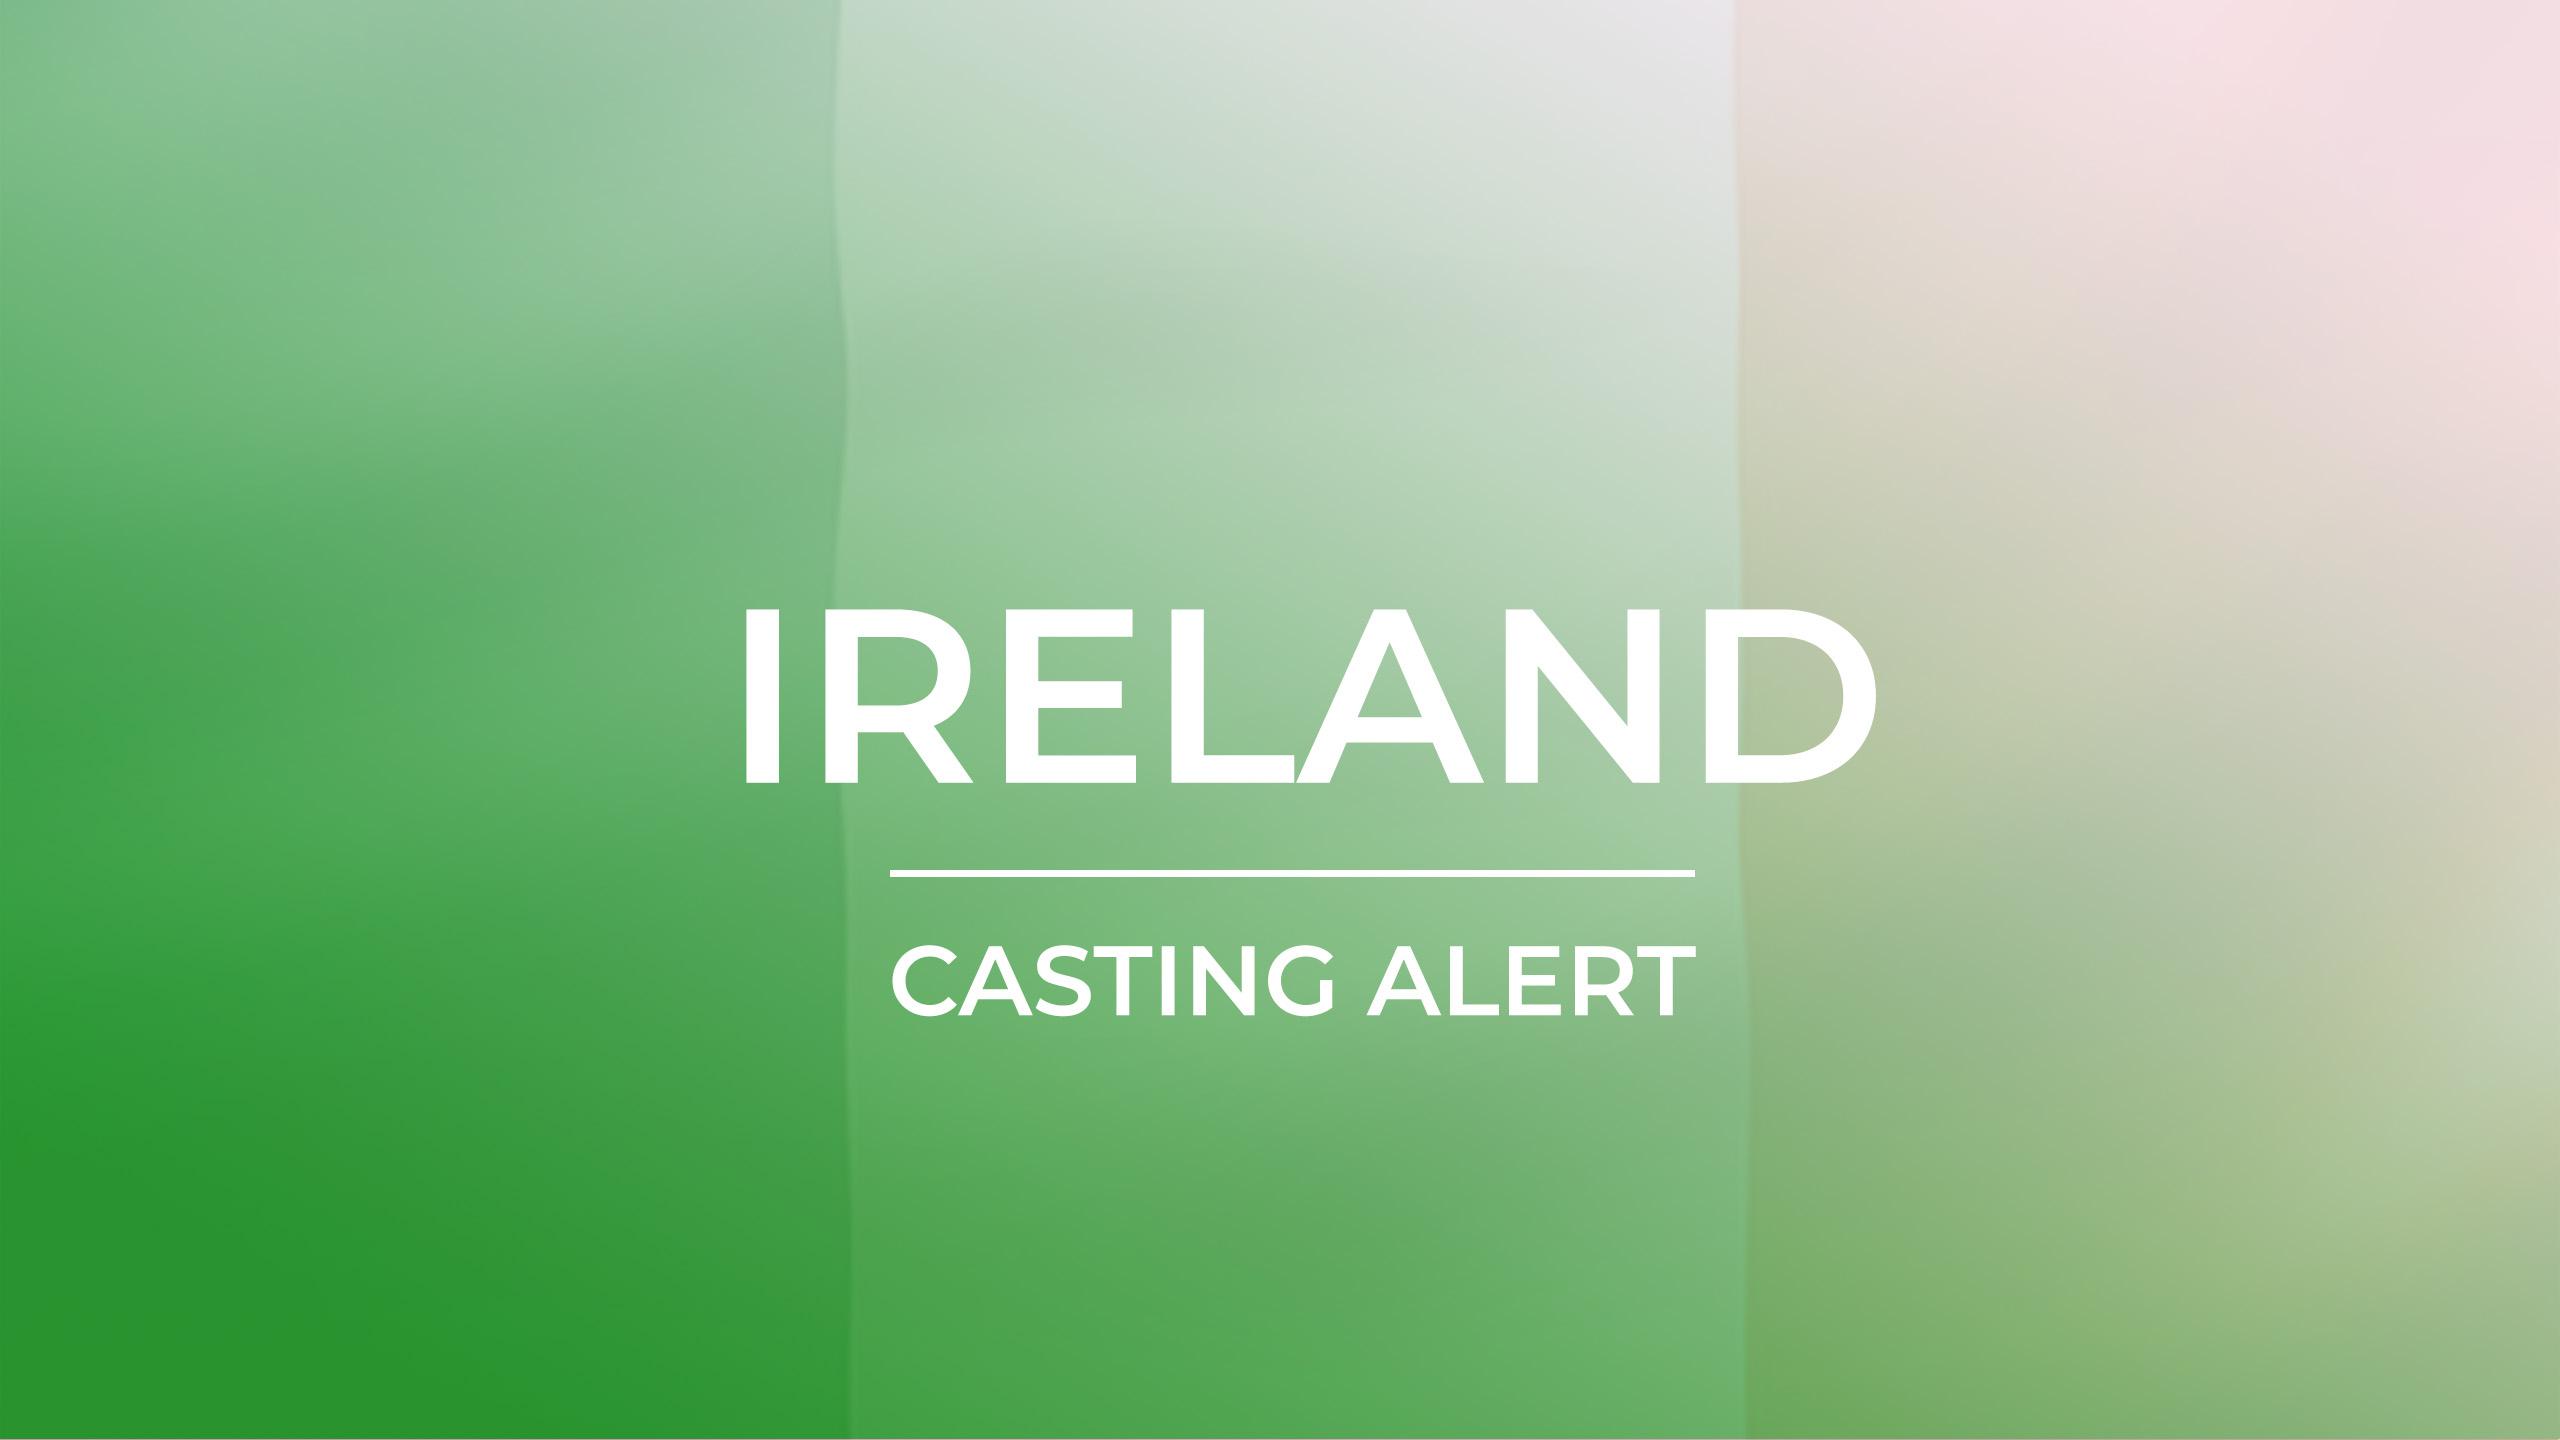 Dev Patel's Movie Green Knight is now casting kid actors in Ireland!